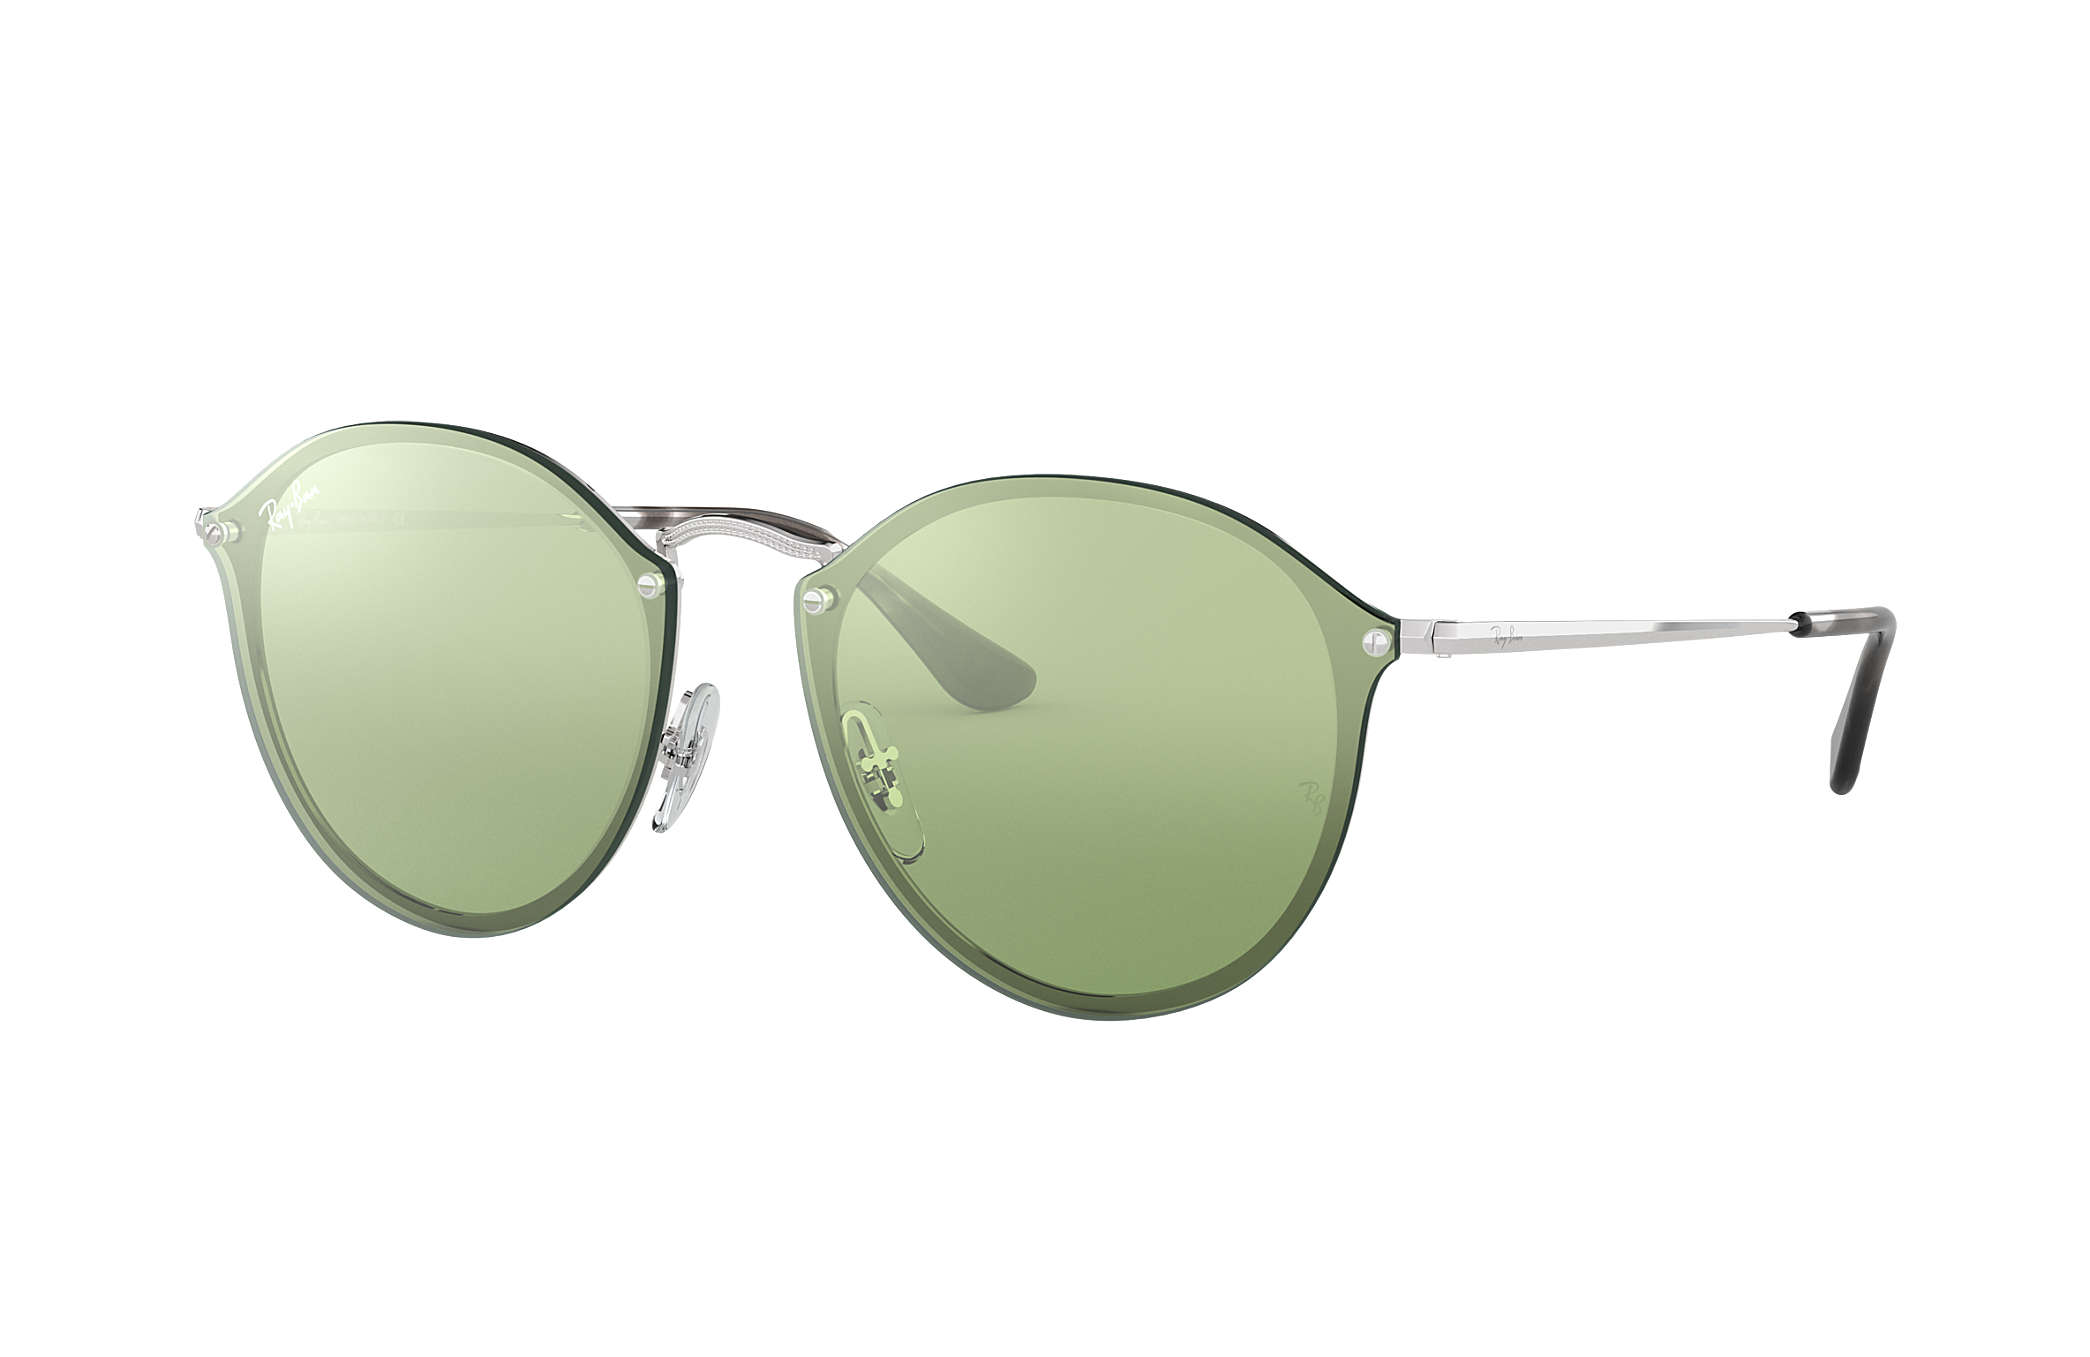 183c9e9a5c08f Ray-Ban Blaze Round RB3574N Silver - Metal - Dark Green Silver ...